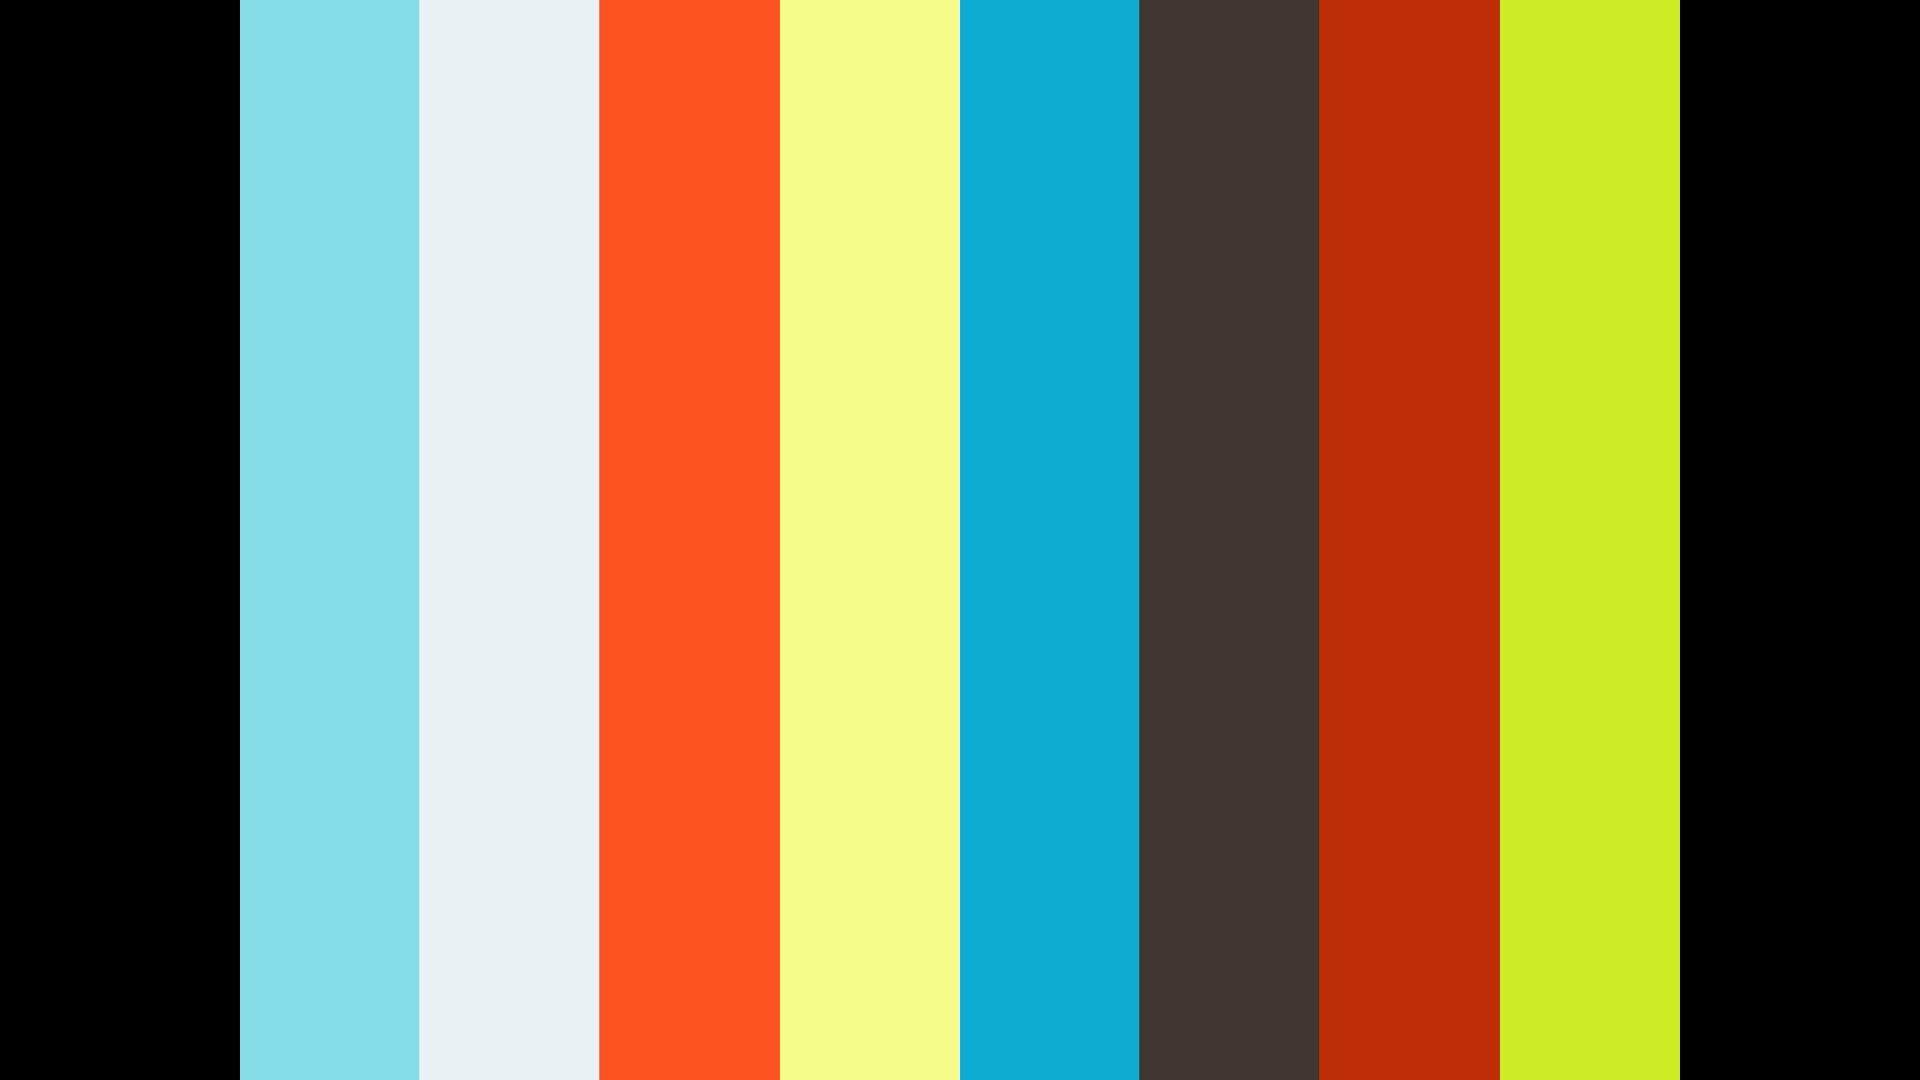 Refurbed TV Commerical Black Friday 2020 DE